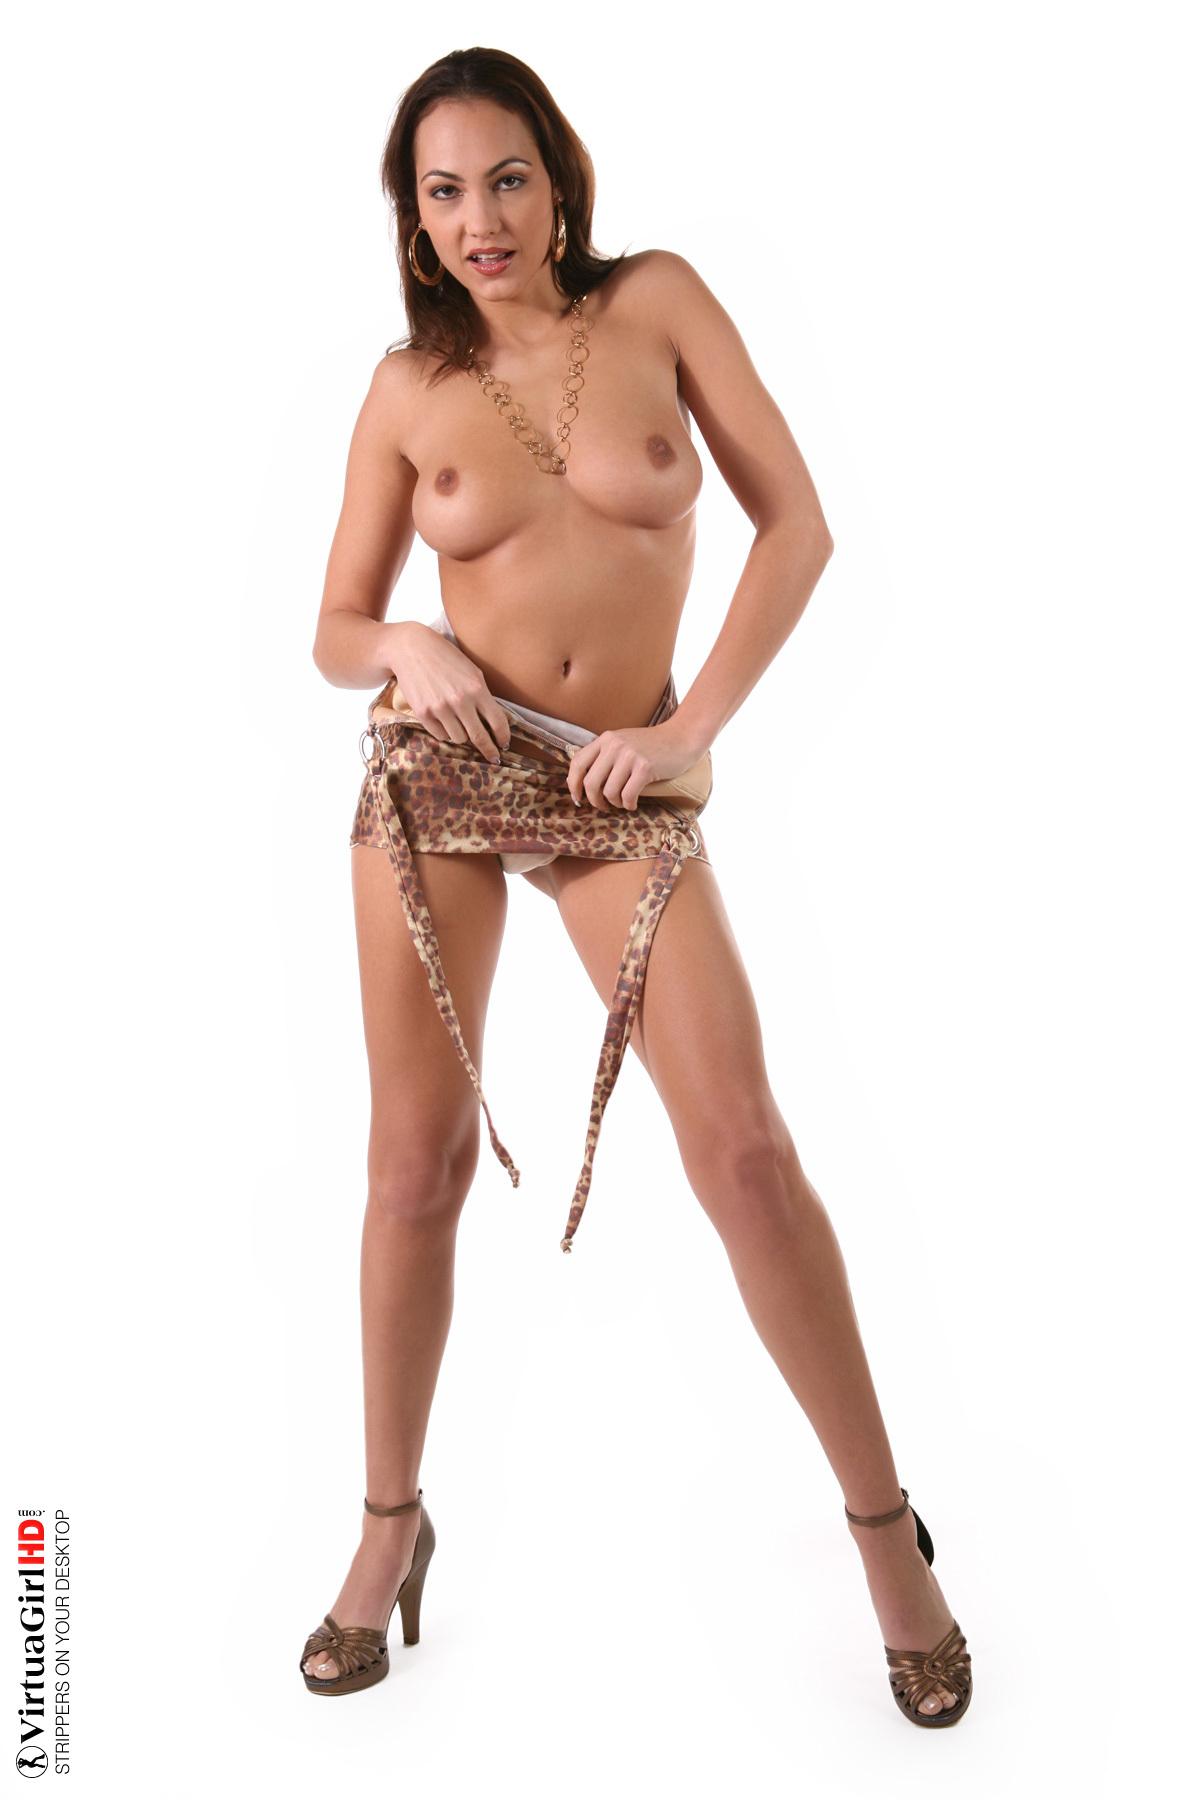 bikini pussy ass